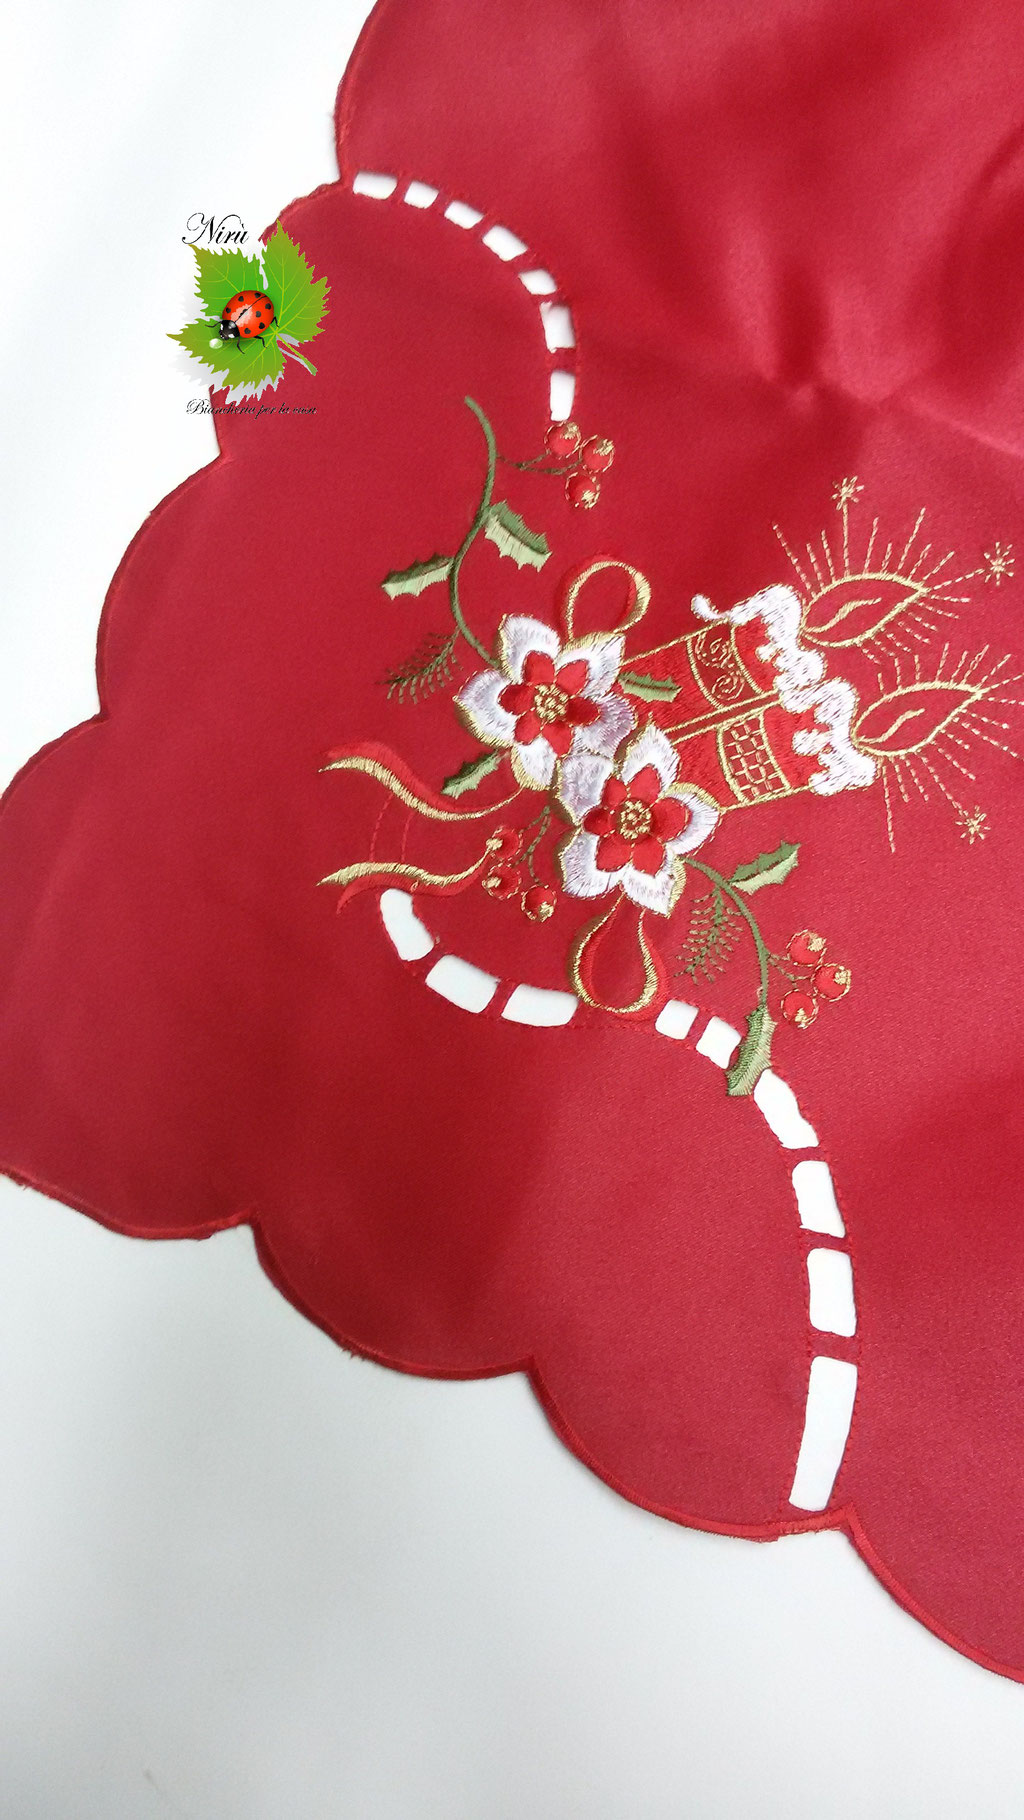 Copritavola tovaglia natalizia da 6 posti 140x180 cm. B83